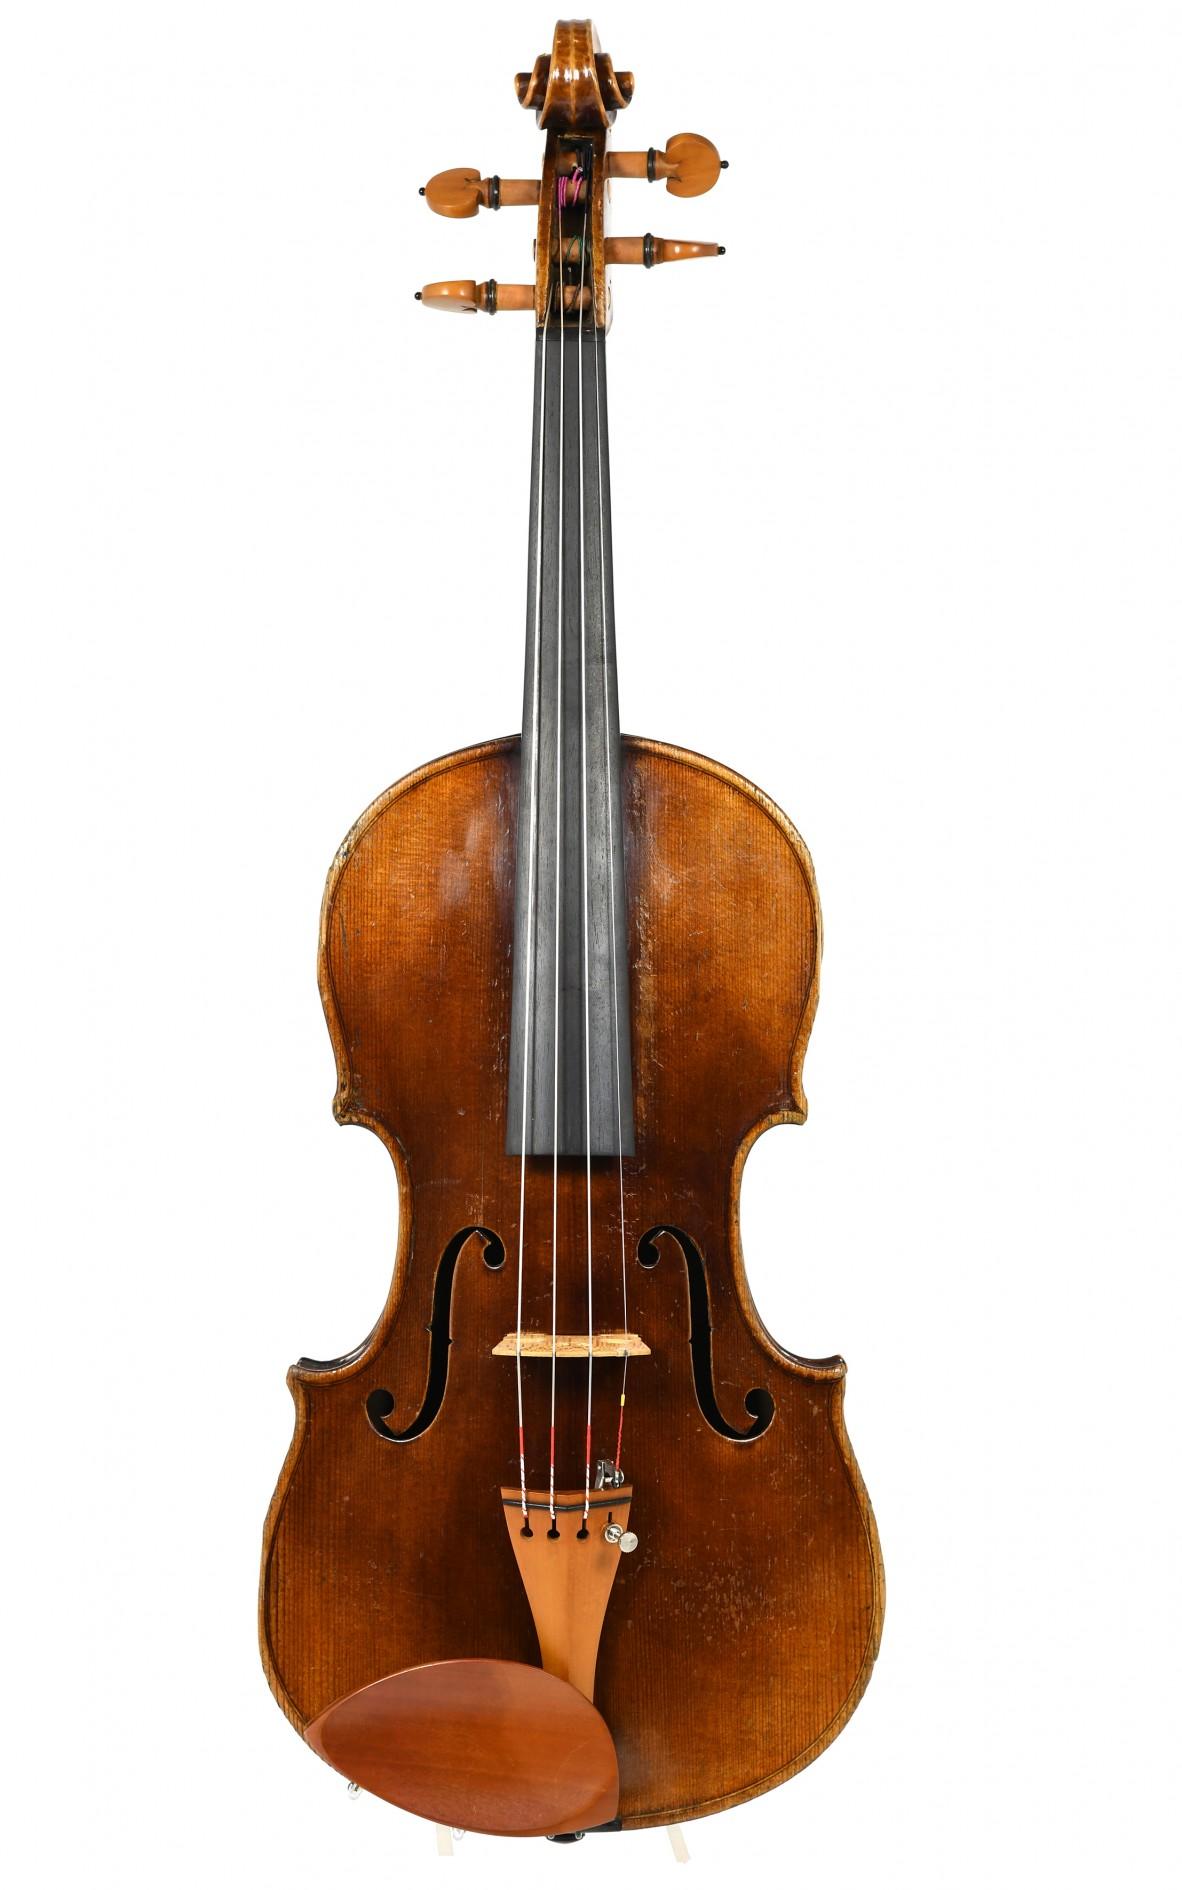 Friedrich August Meisel, violin 1910 - table